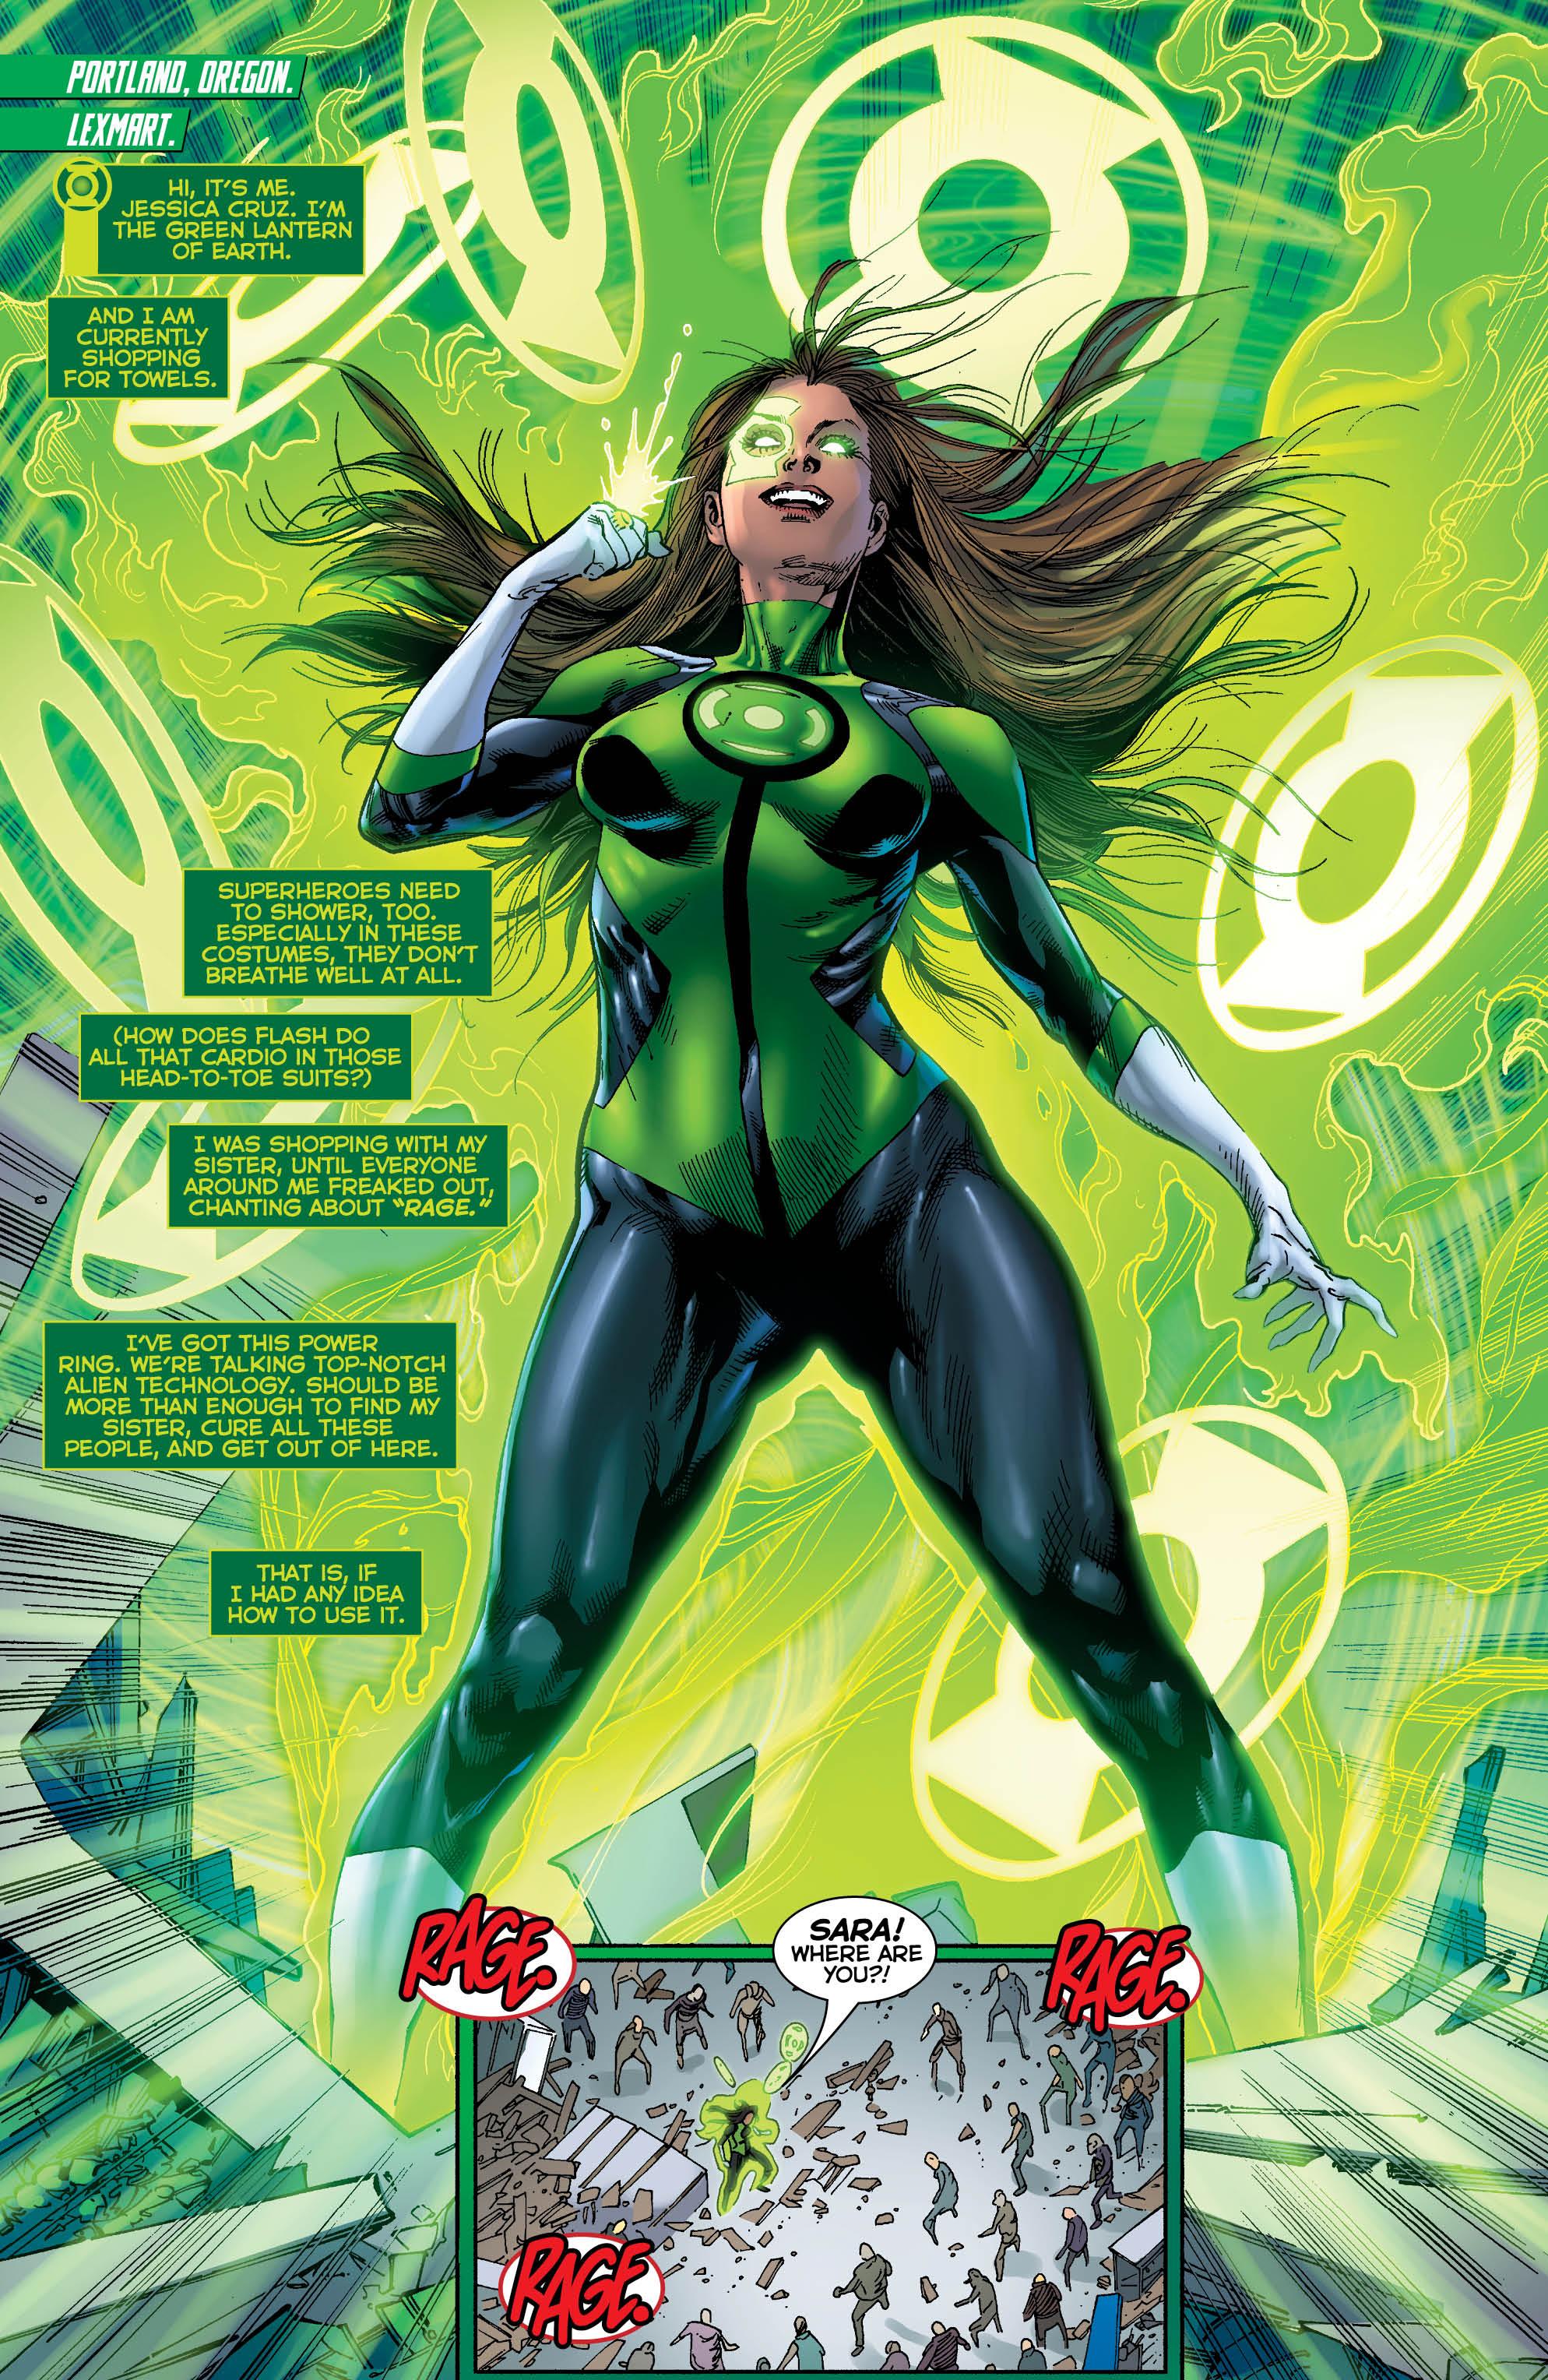 Dc Reborn Review Green Lanterns 2 Fails To Reignite A Flagging